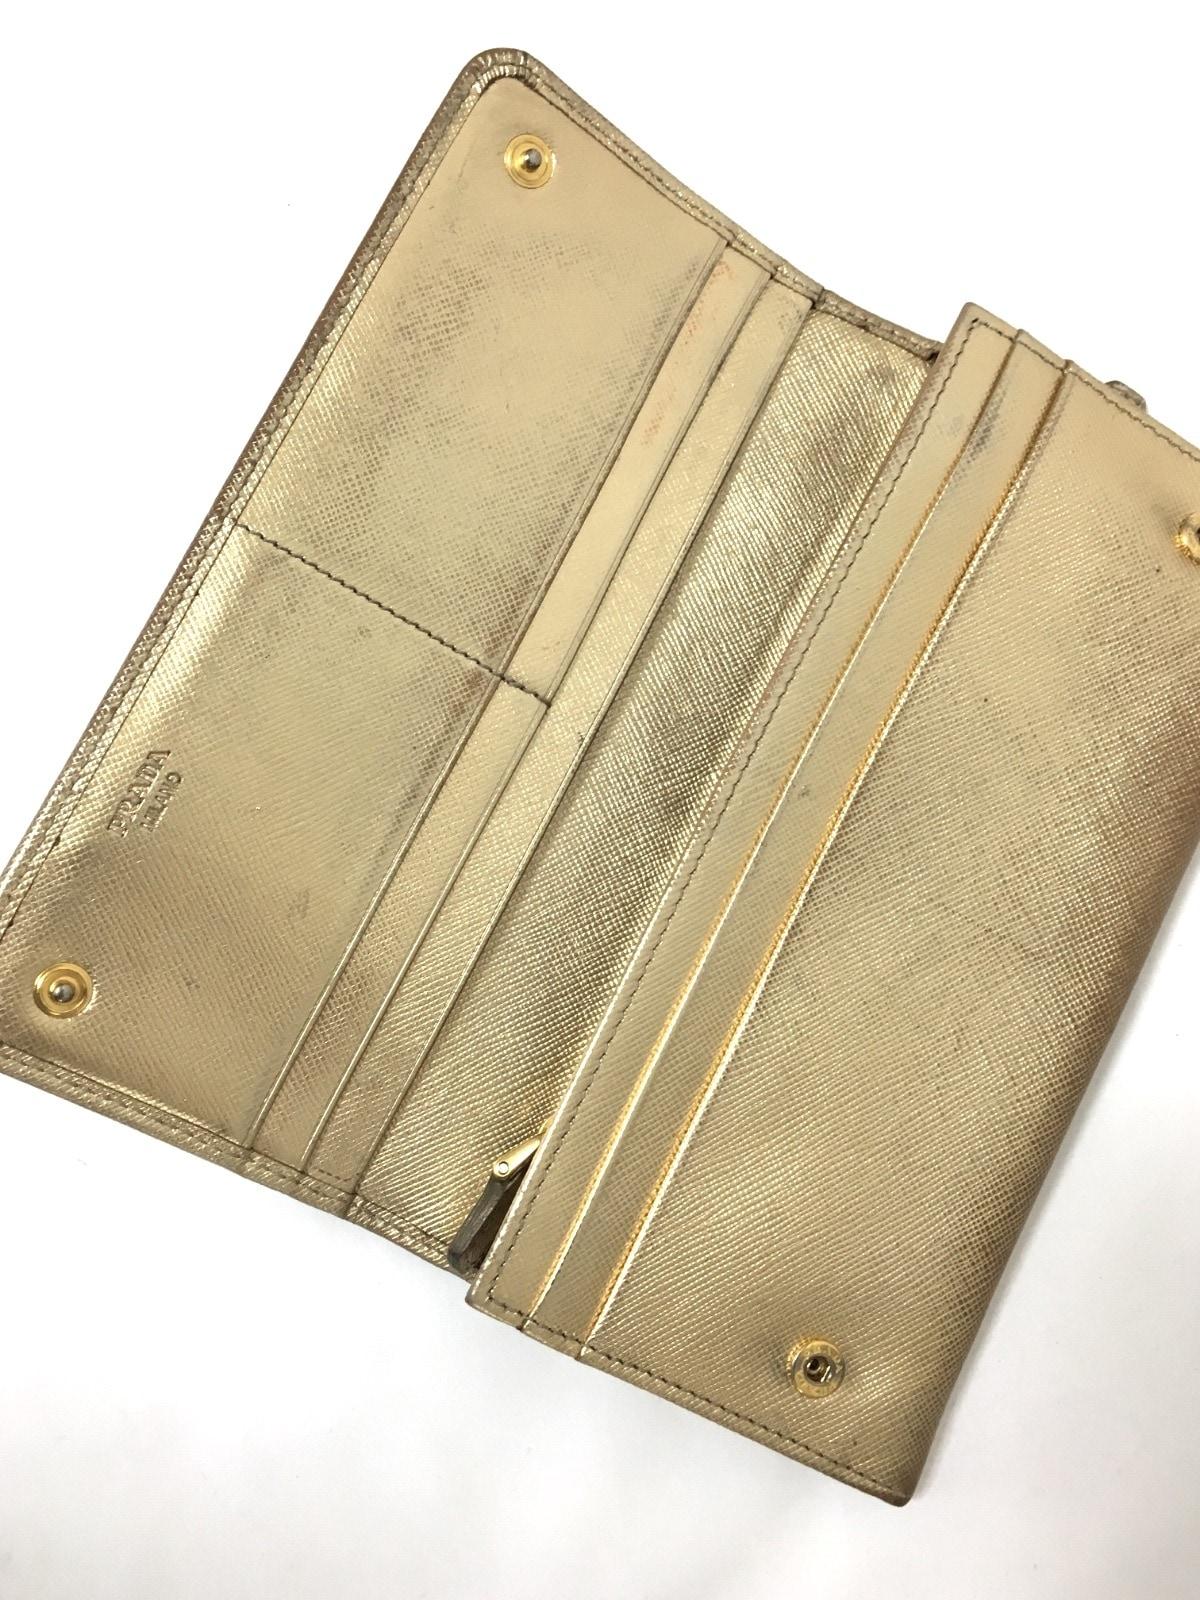 087d2c9ad0a6 PRADA(プラダ) 長財布 - ゴールド リボン レザー(13124118)中古 ...